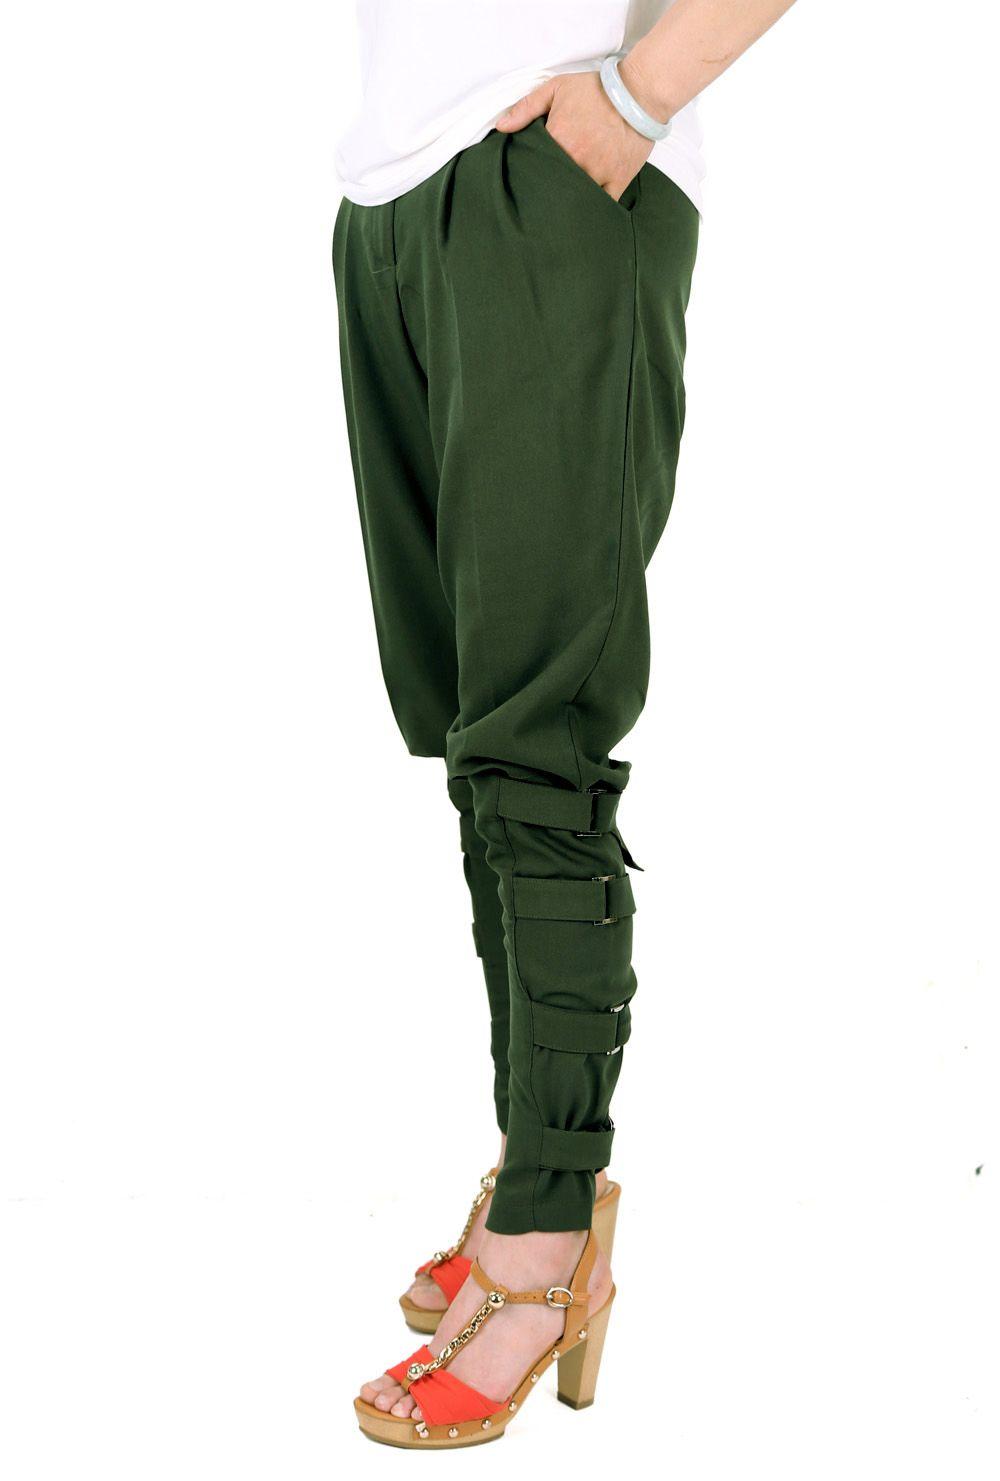 4b5a655f Preself fall Casual Plus size women ArmyGreen pant woman design ...